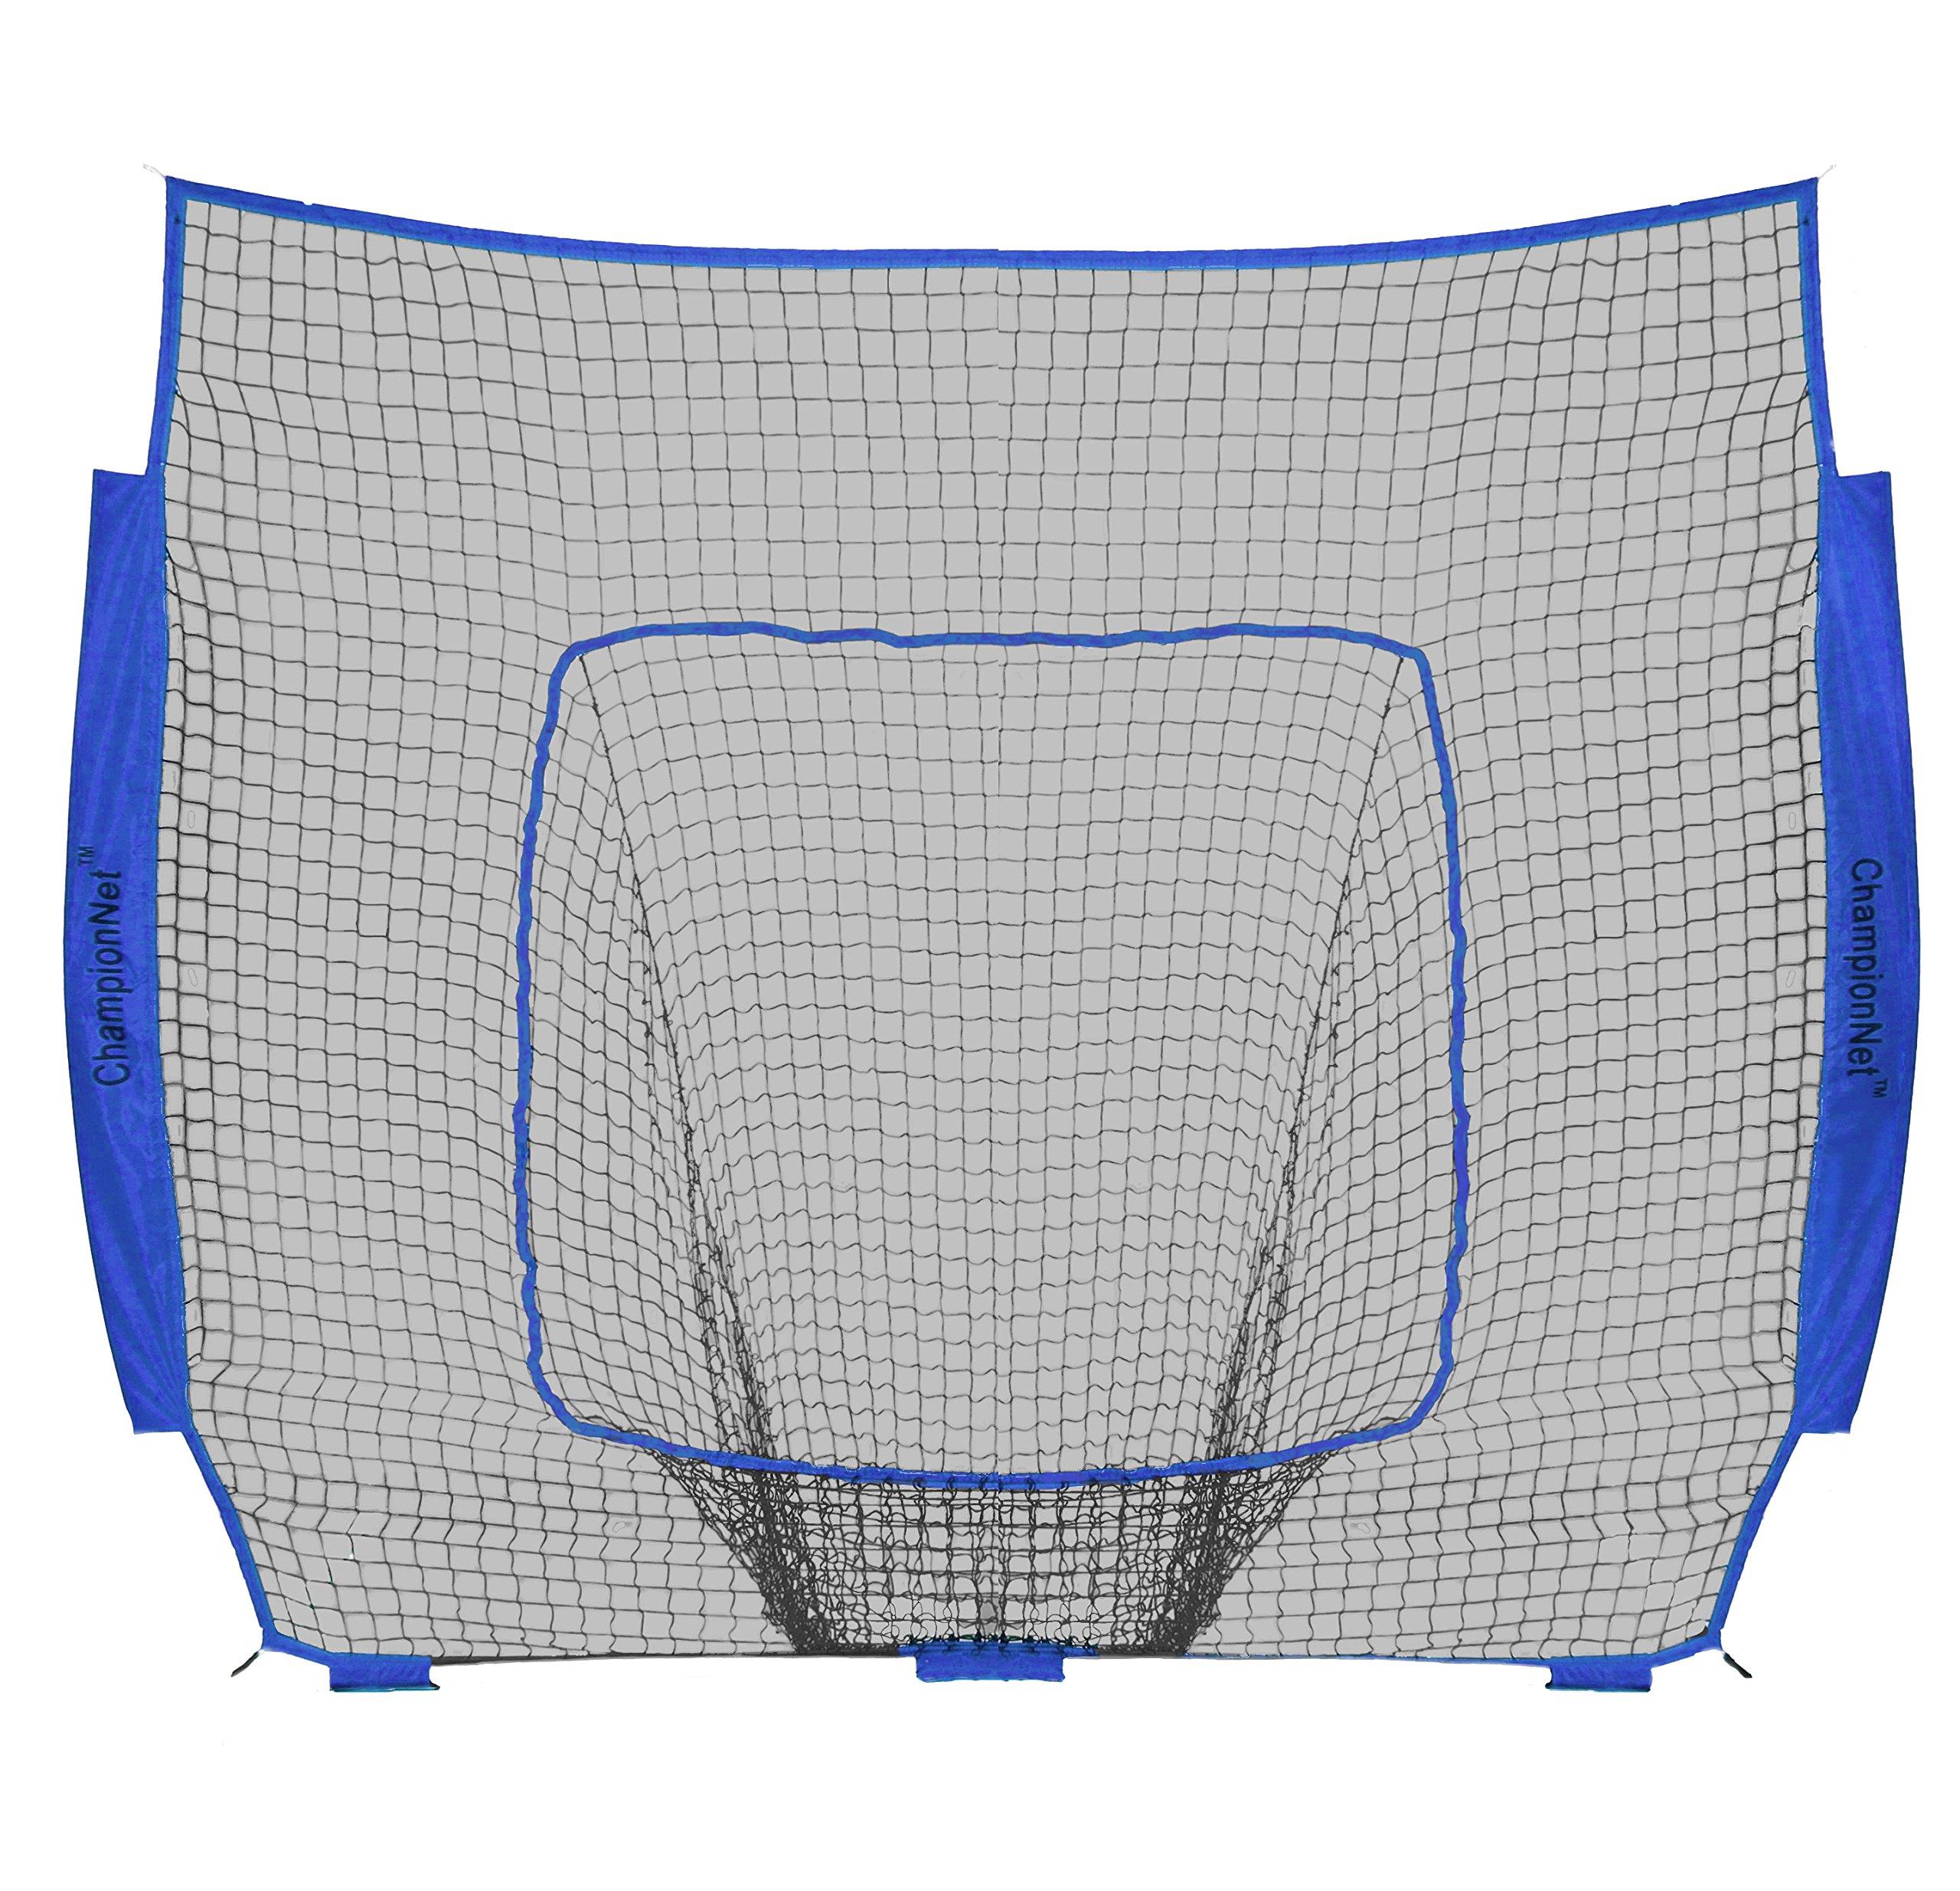 ChampionNet Baseball/Softball 7' x 7' Hitting Net Replacement NO Frame - Royal Blue by ChampionNet